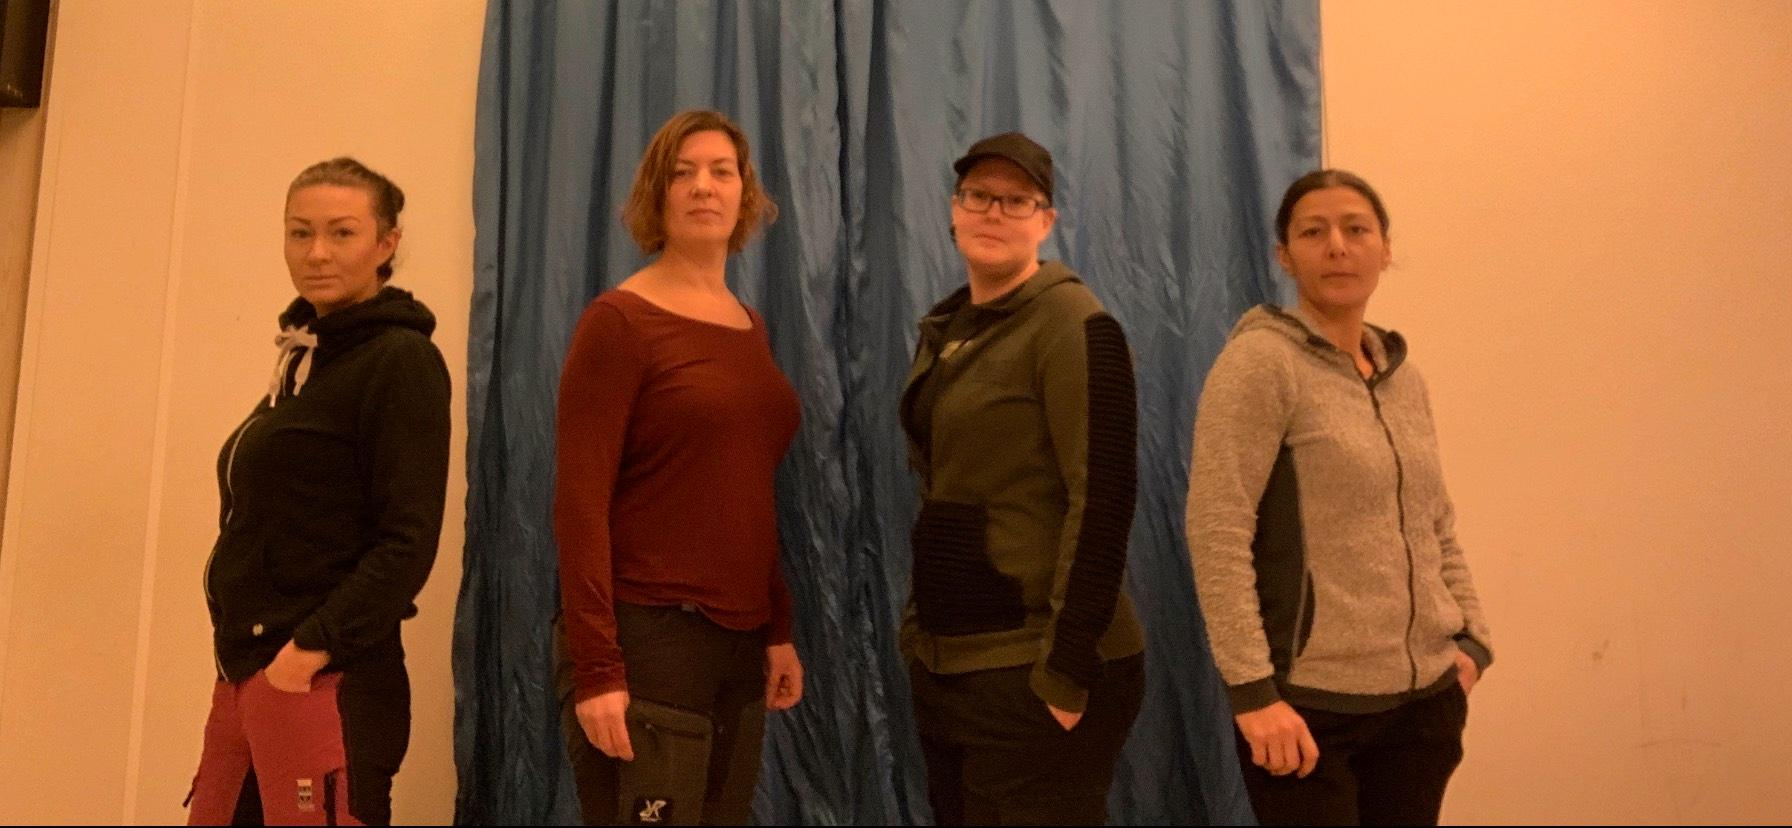 Hatice, Samantha, Anneli och Marlene.